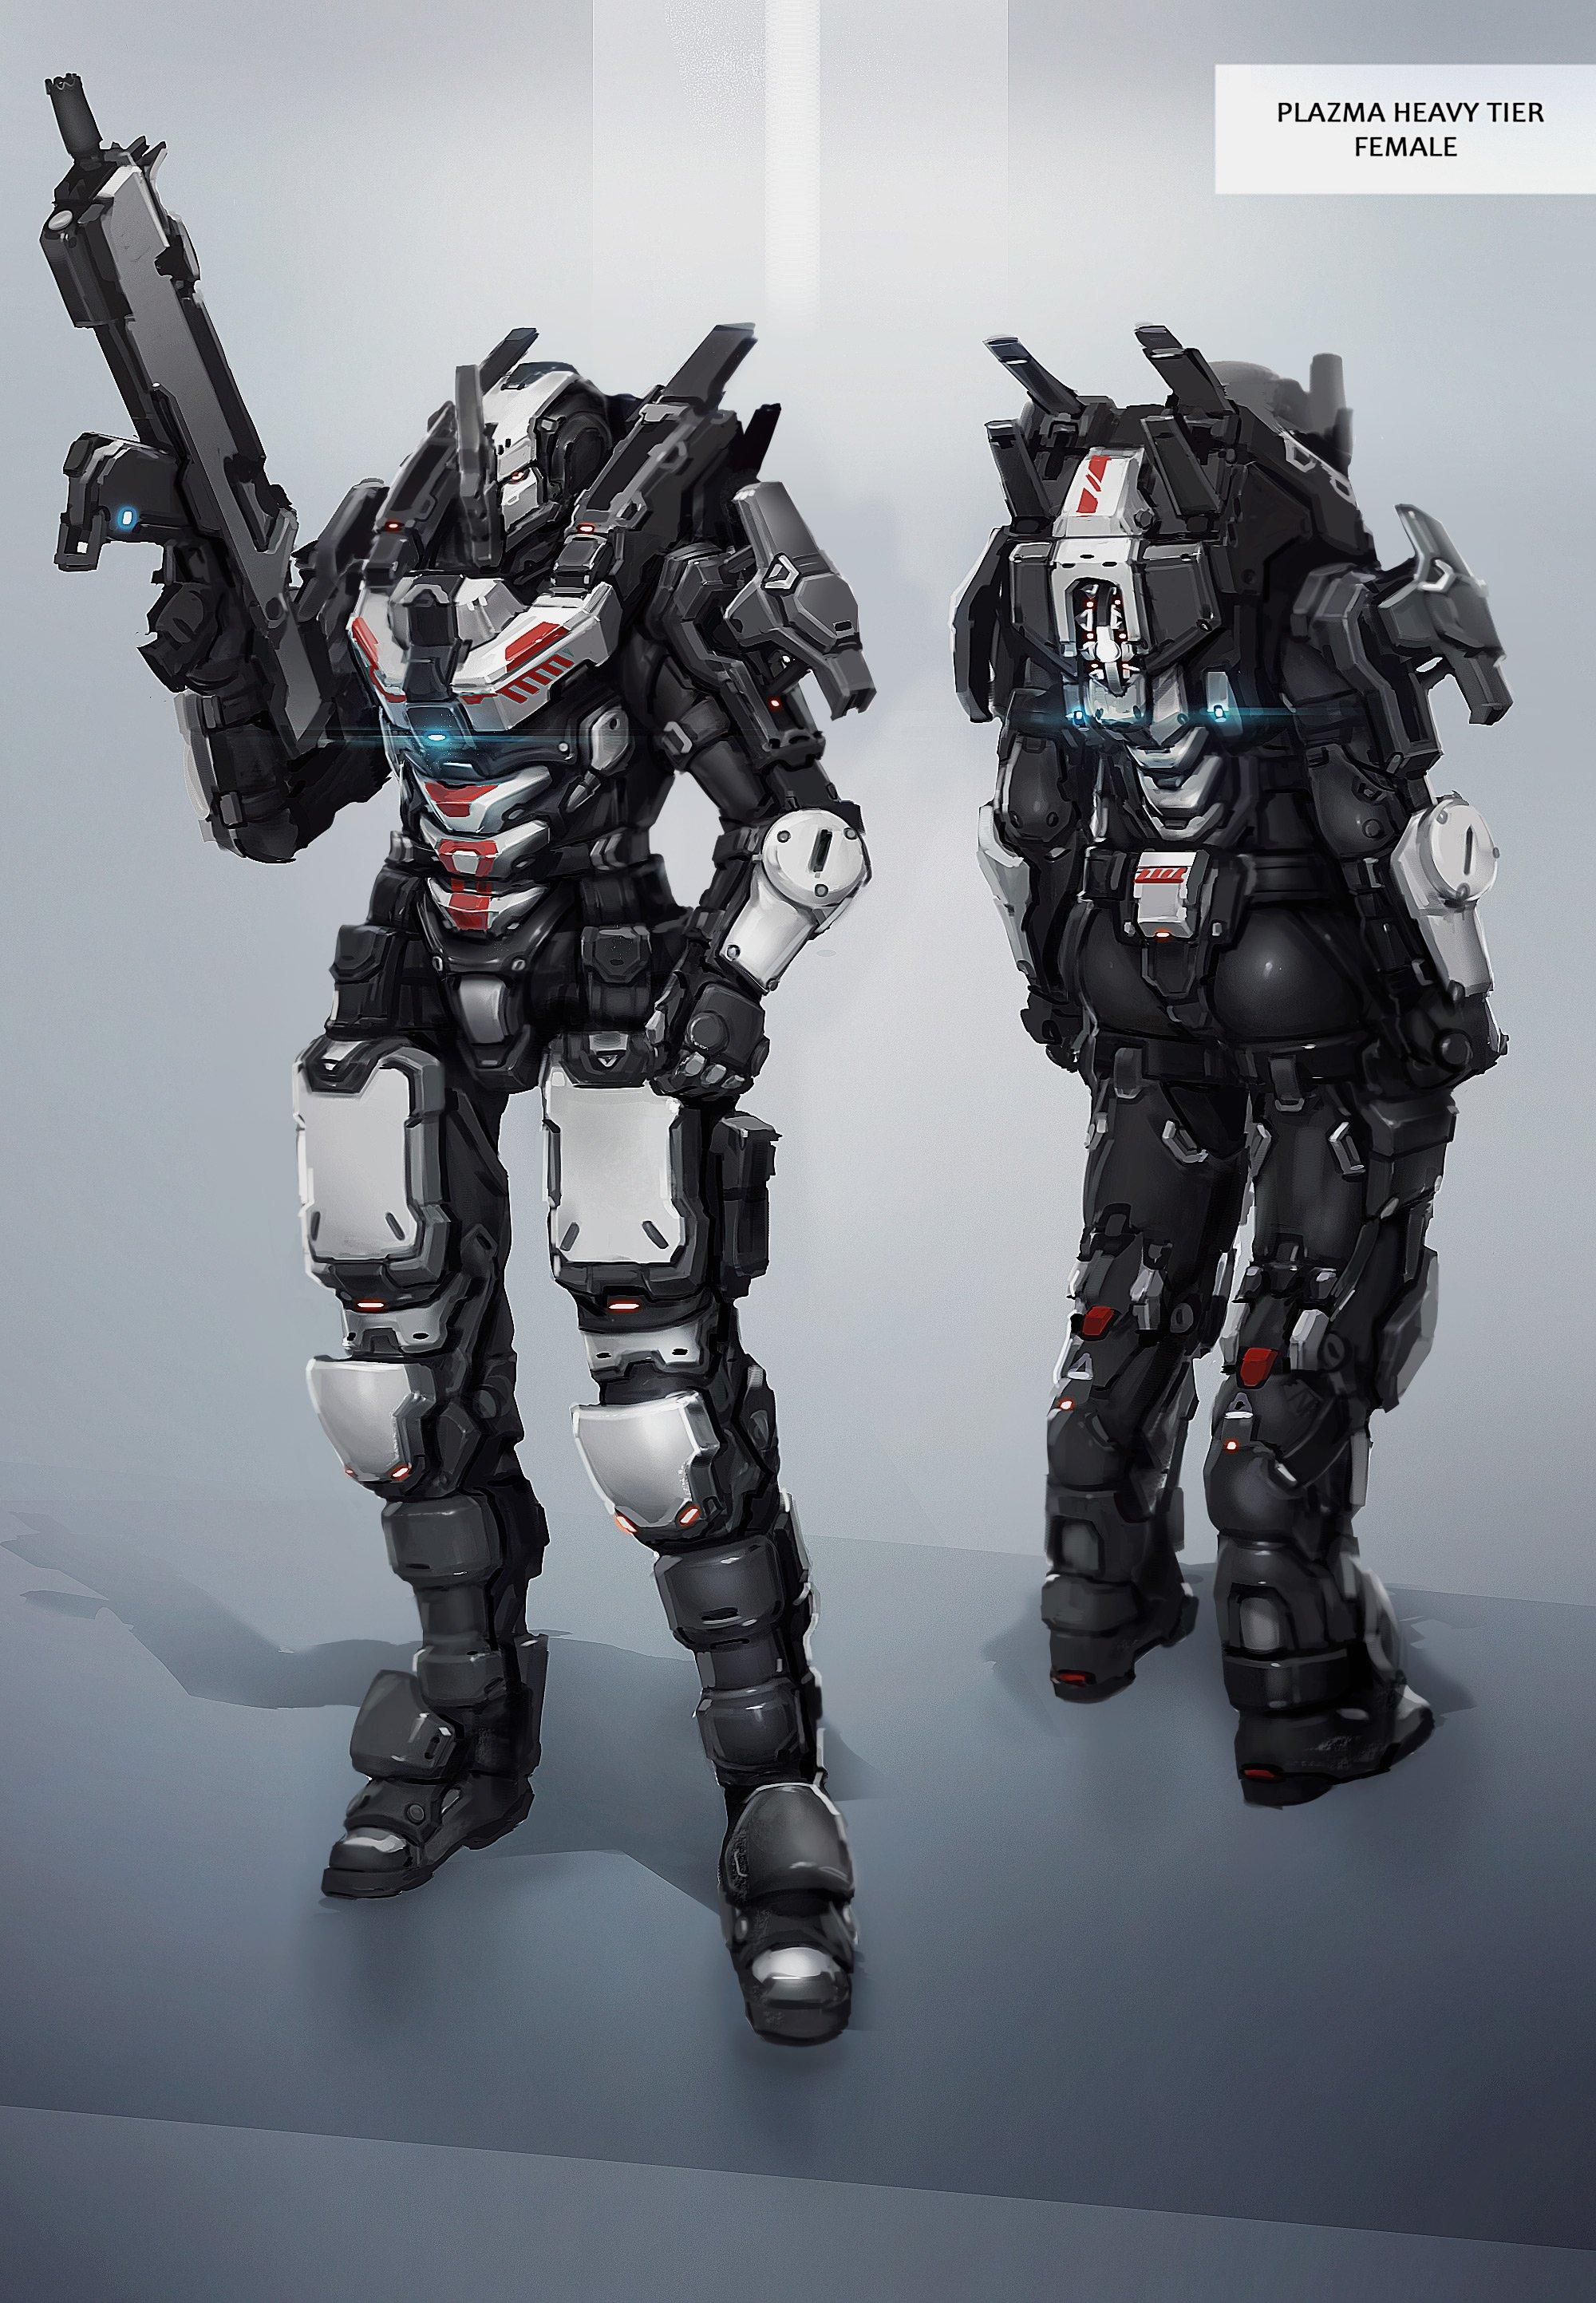 Sci-fi MMORPG Project Genom - начало. - Изображение 6